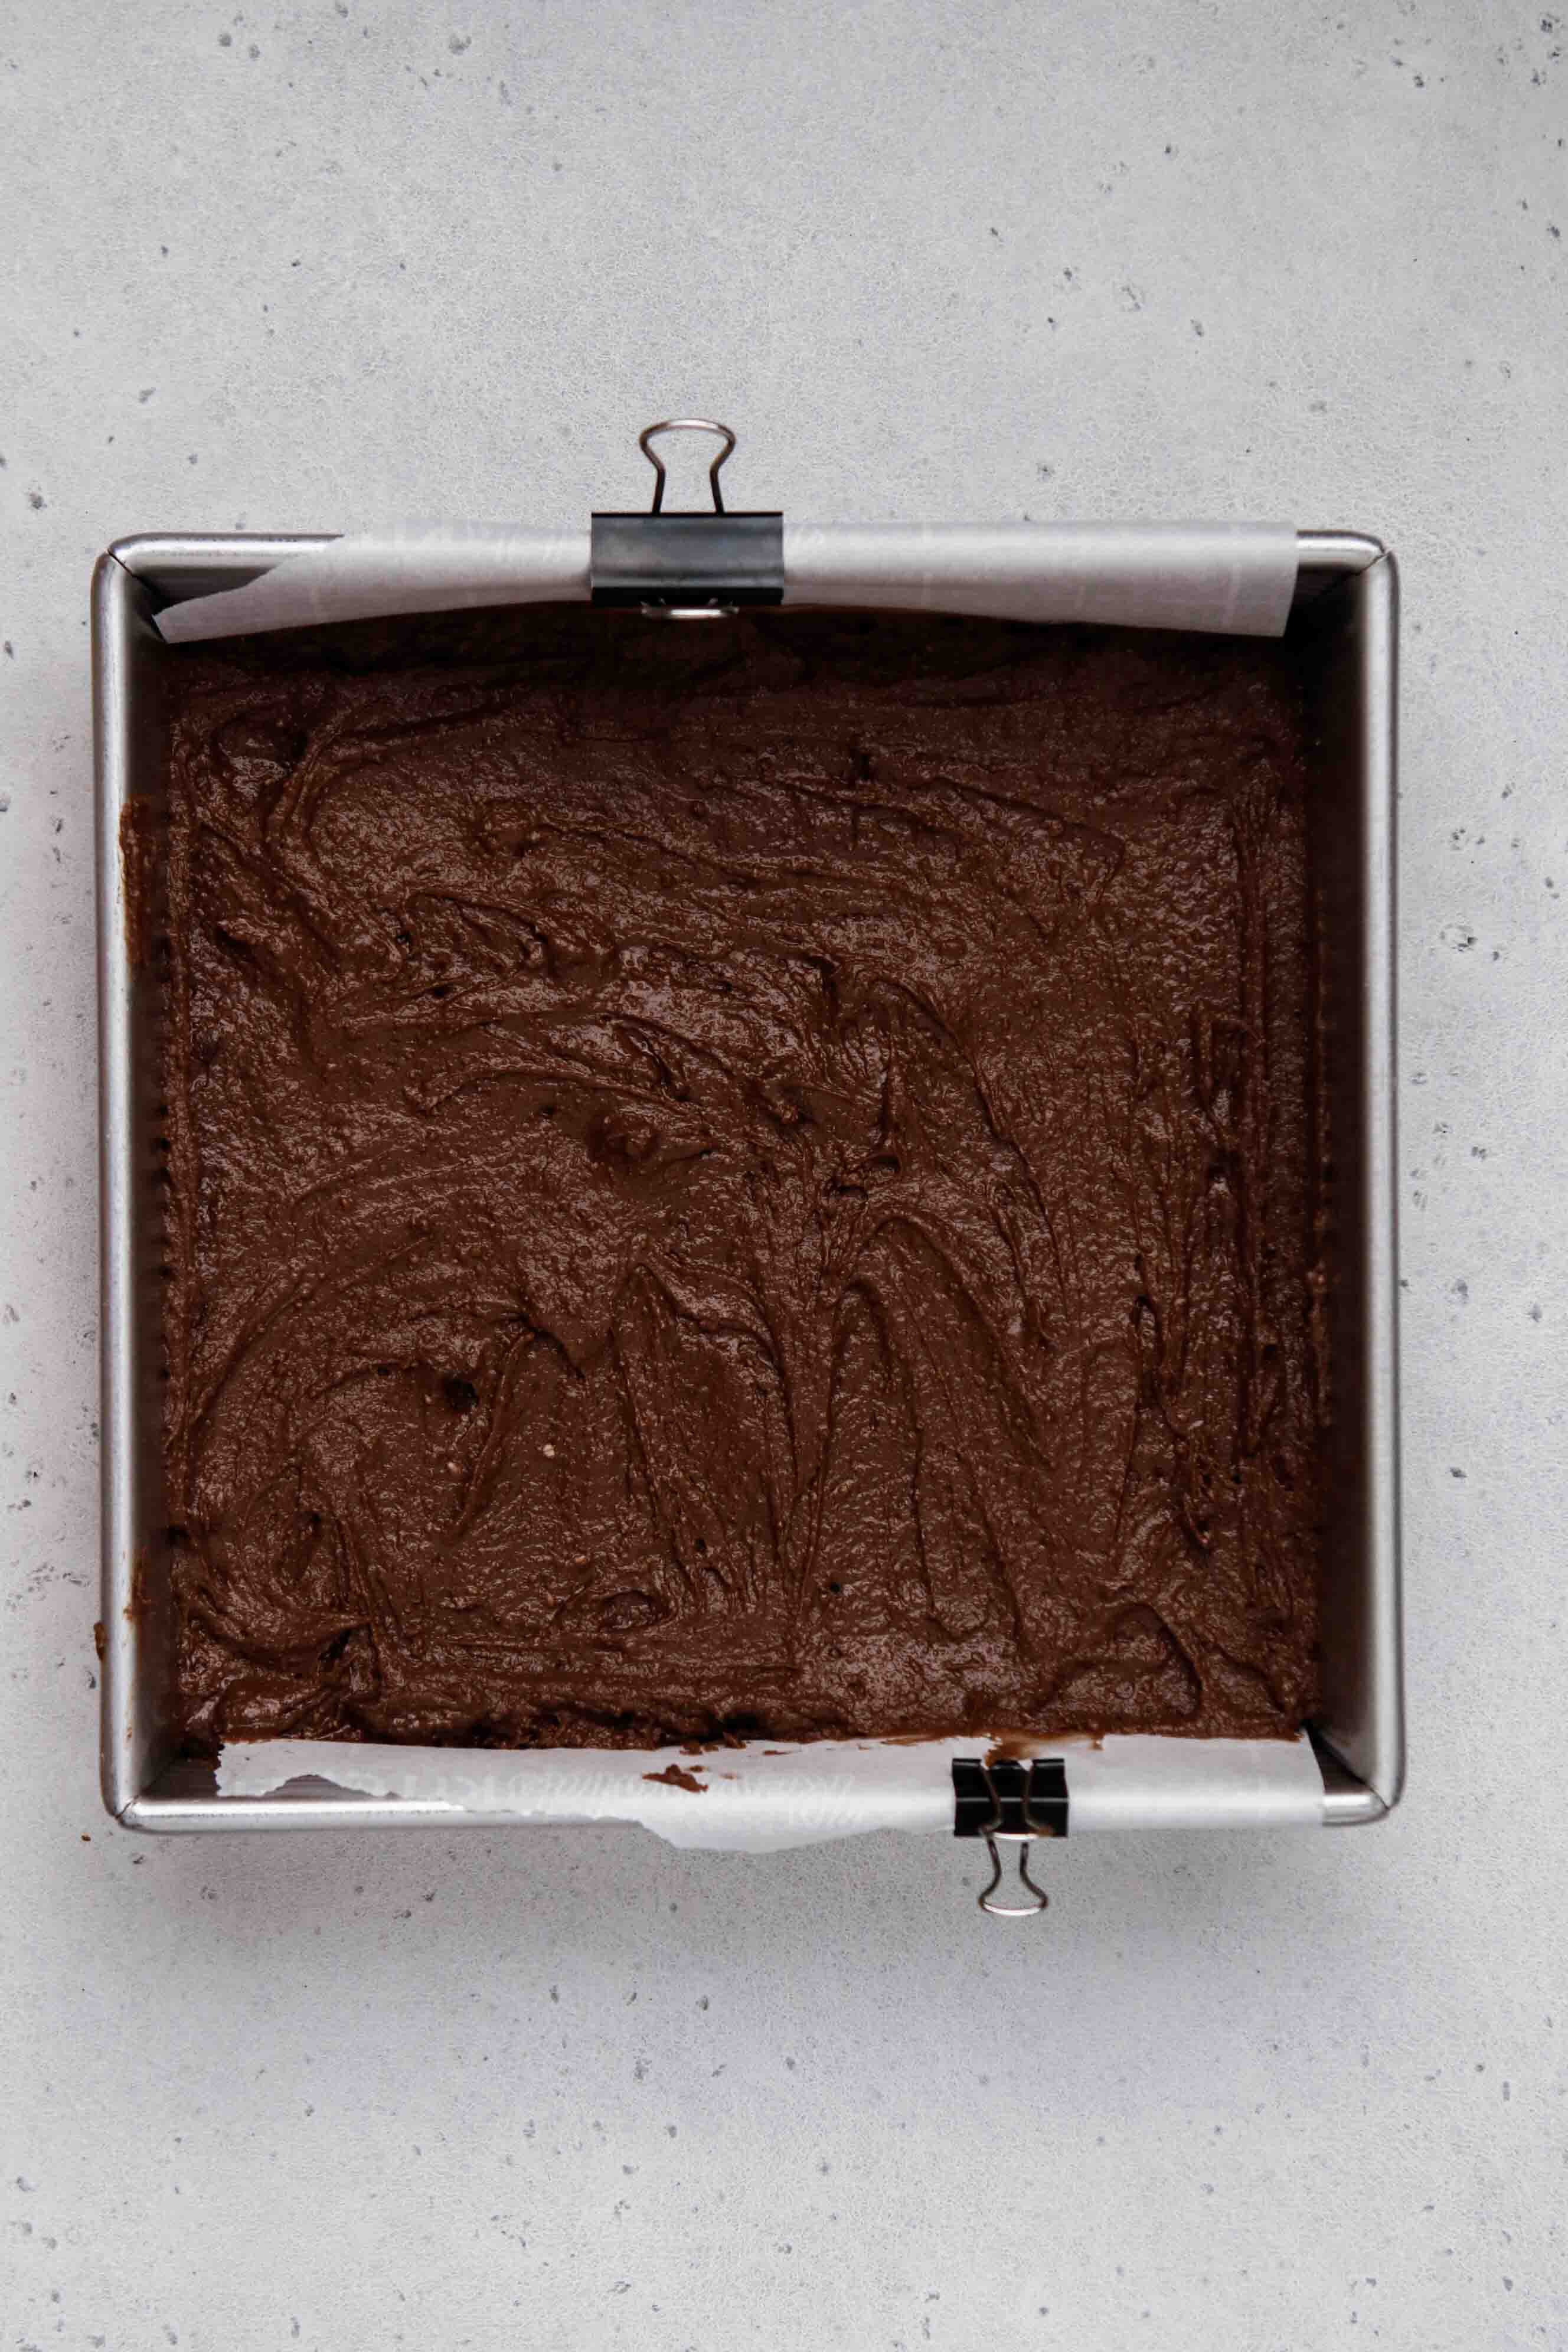 brownie mix batter